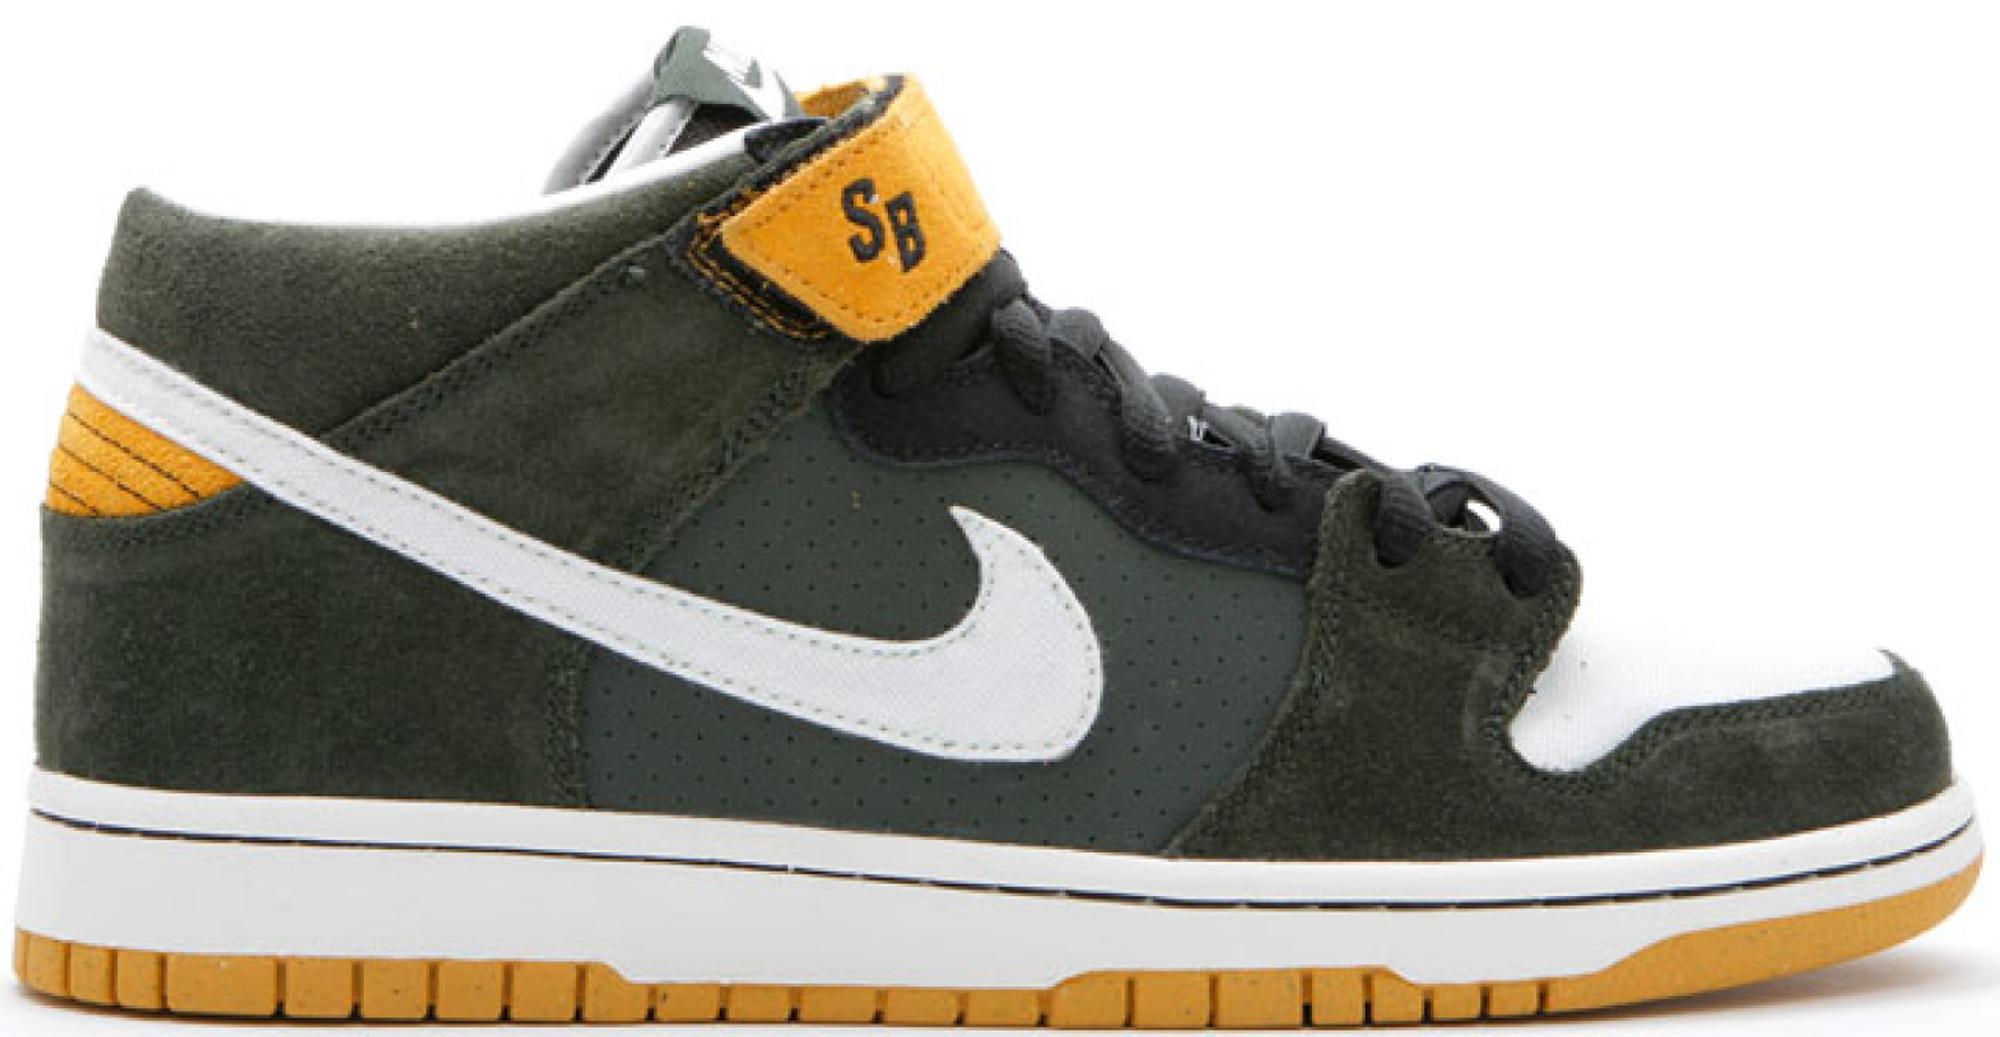 Nike SB Dunk Mid Green Bay Packers